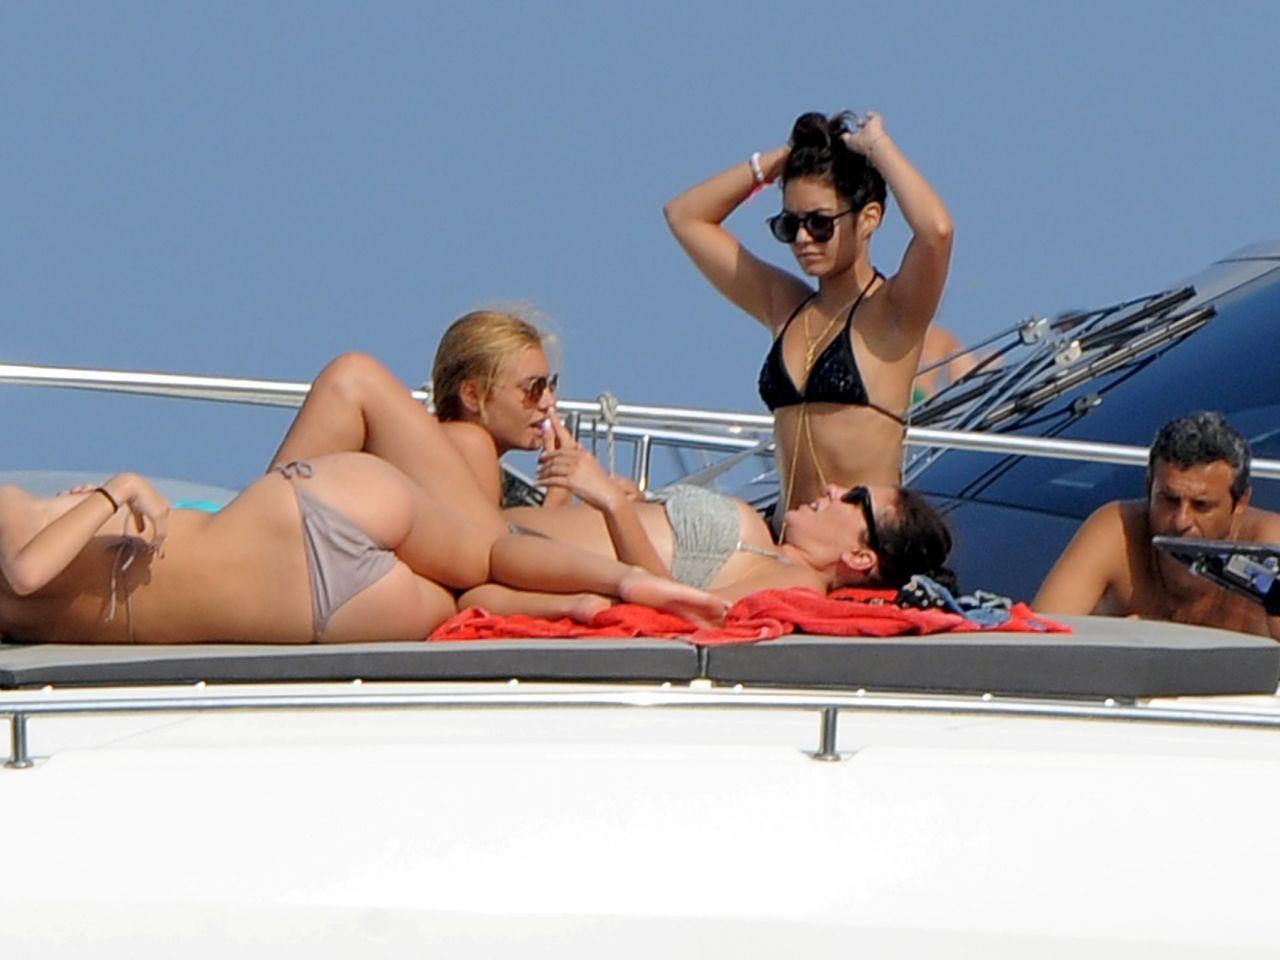 Bikini On A Boat